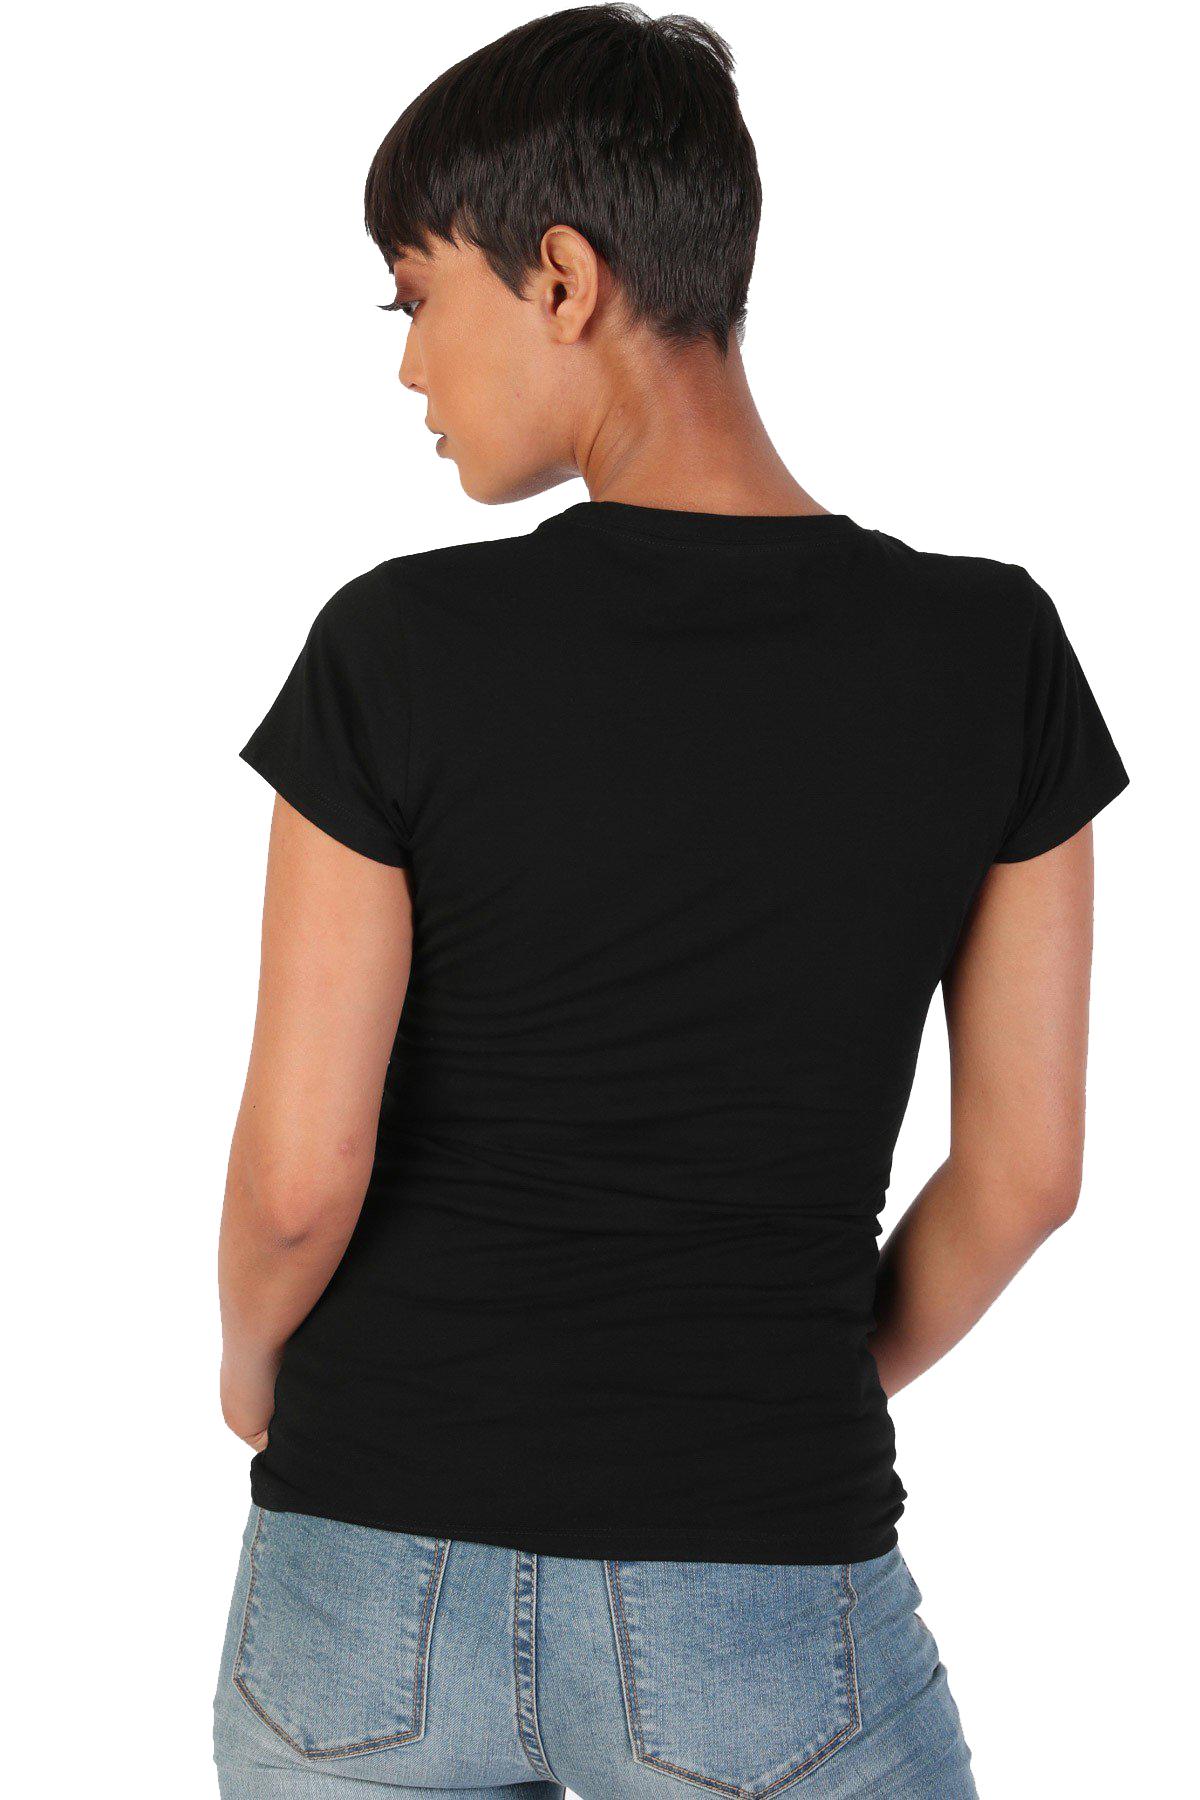 Women-039-s-Juniors-Patriotic-Casual-Graphic-Print-Short-Sleeve-T-Shirt-Top thumbnail 7